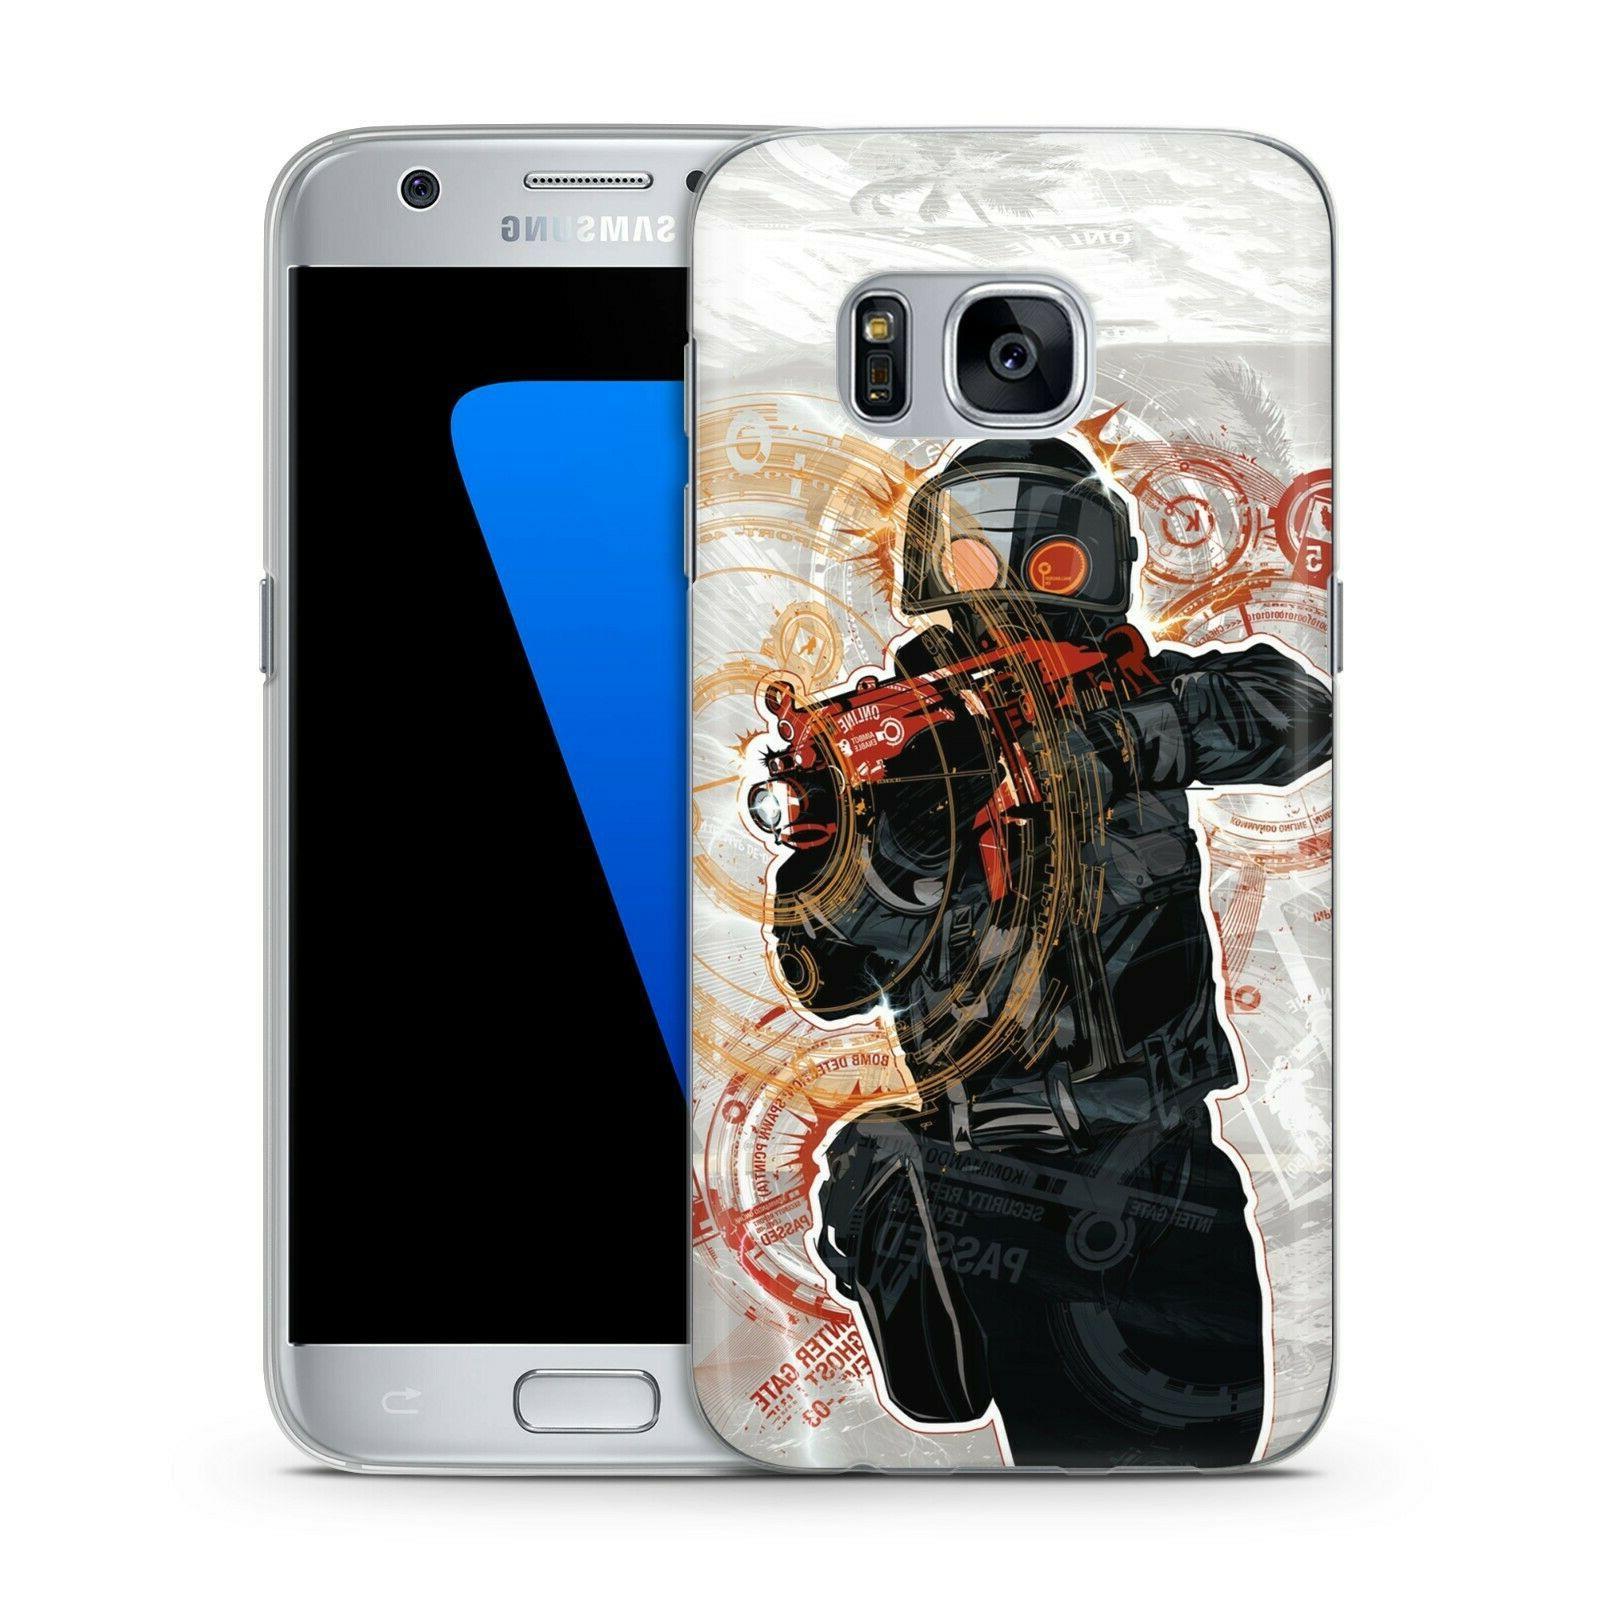 Shooter Video Game CS GO For Samsung J